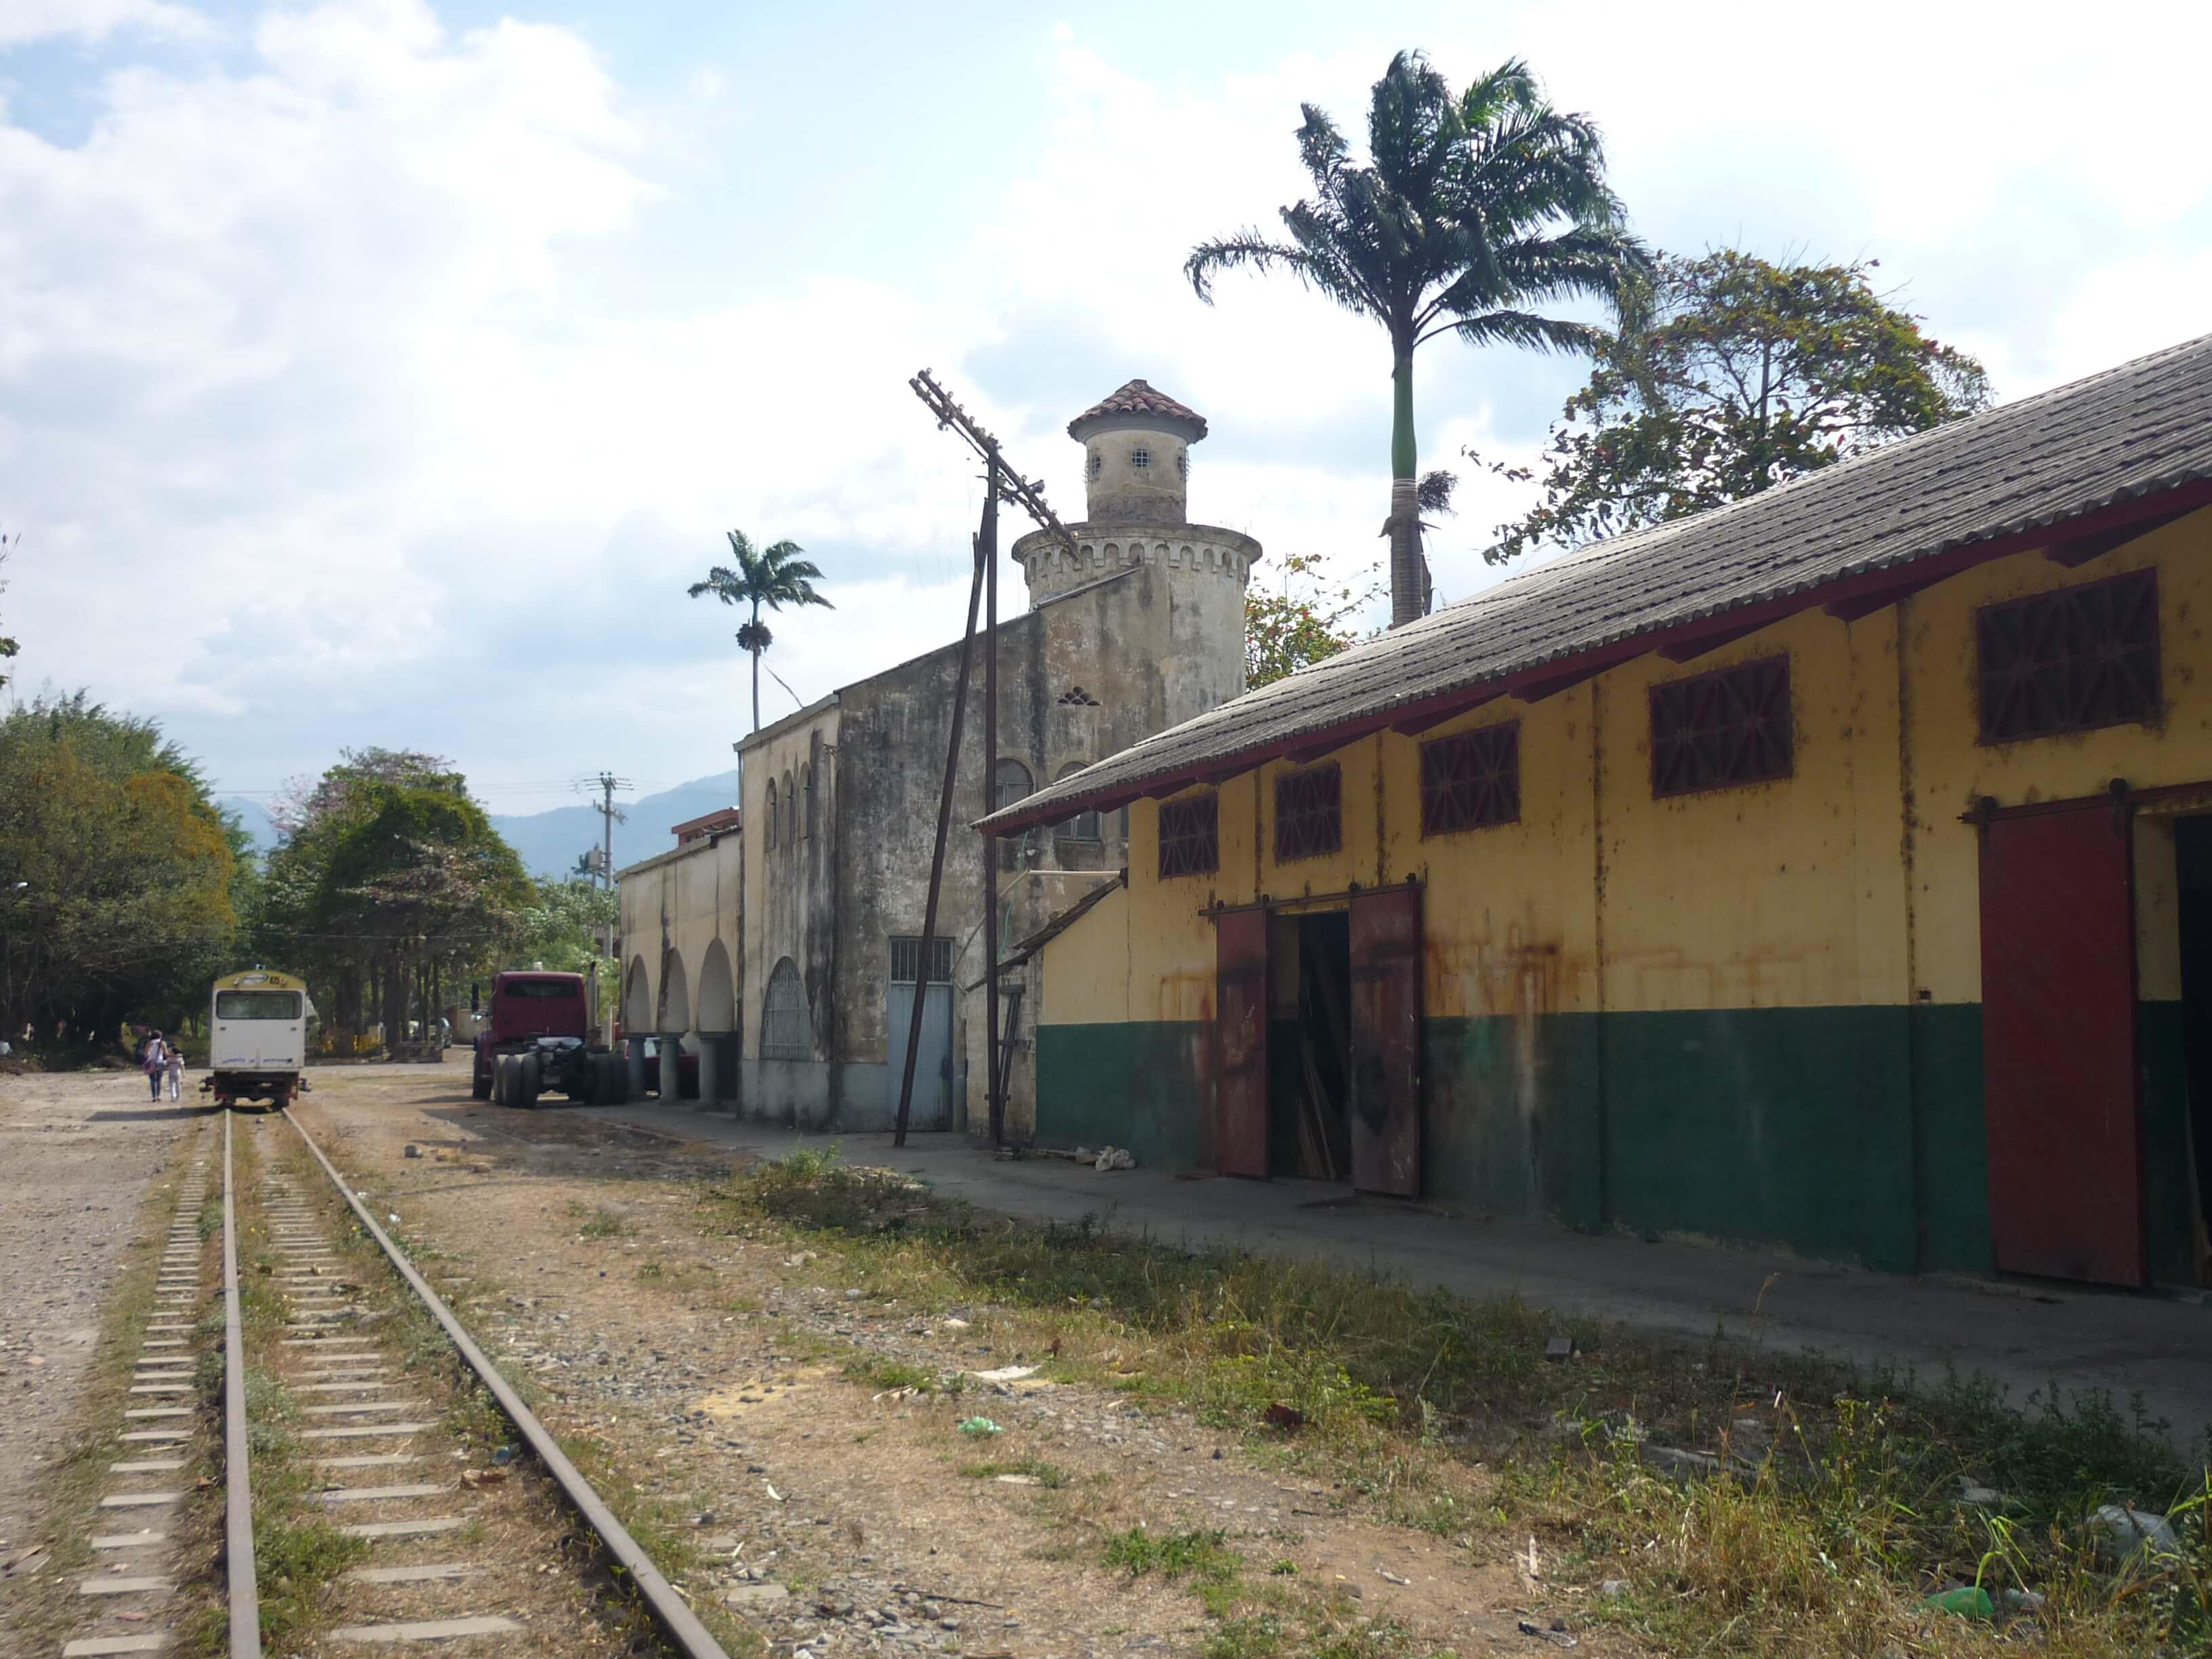 Villeta Railway Station, Cundimarca, Colombia